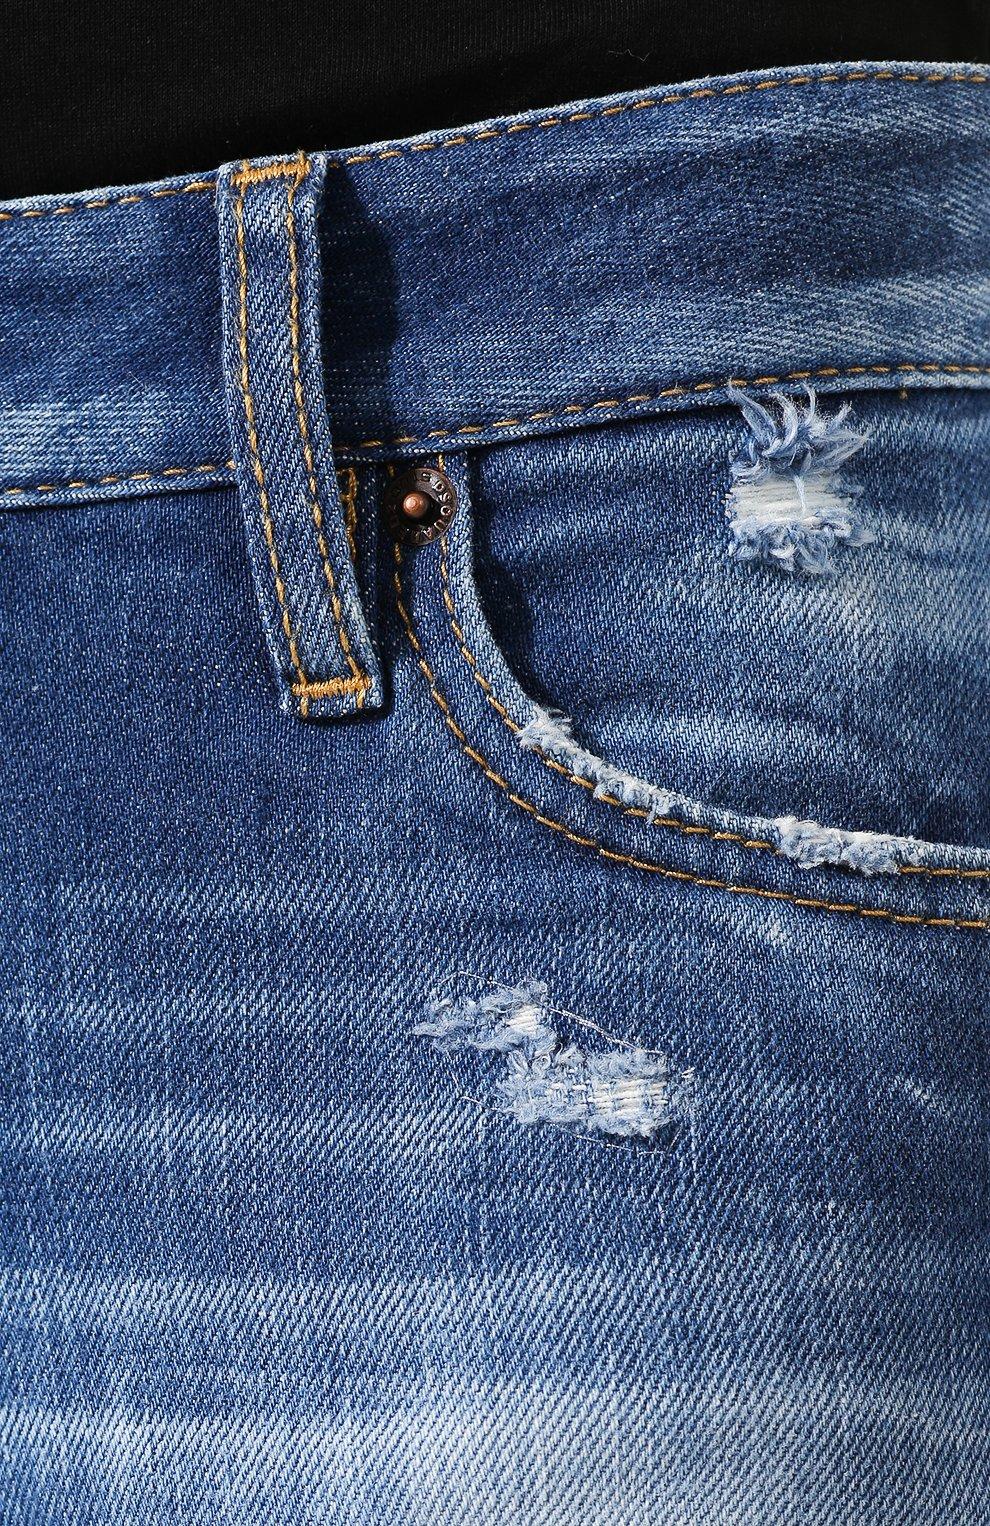 Женские джинсы DSQUARED2 синего цвета, арт. S75LB0280/S30663 | Фото 5